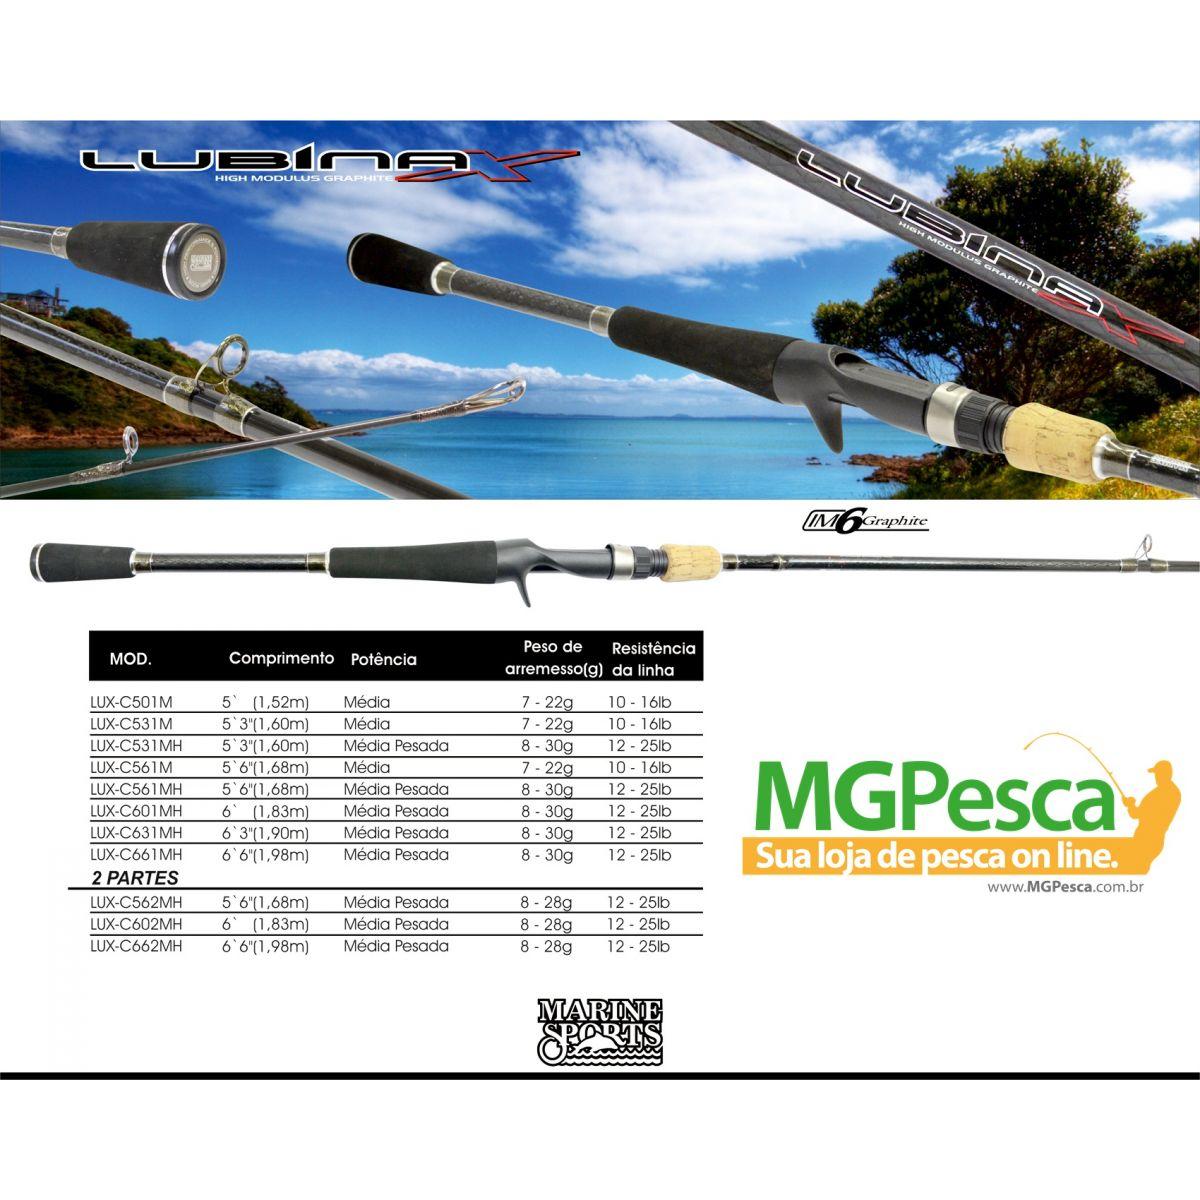 "Vara para carretilha Marine Sports Lubina X 6´6"" (1,98m) 25 Lbs - LUX-C662MH - 02 partes  - MGPesca"